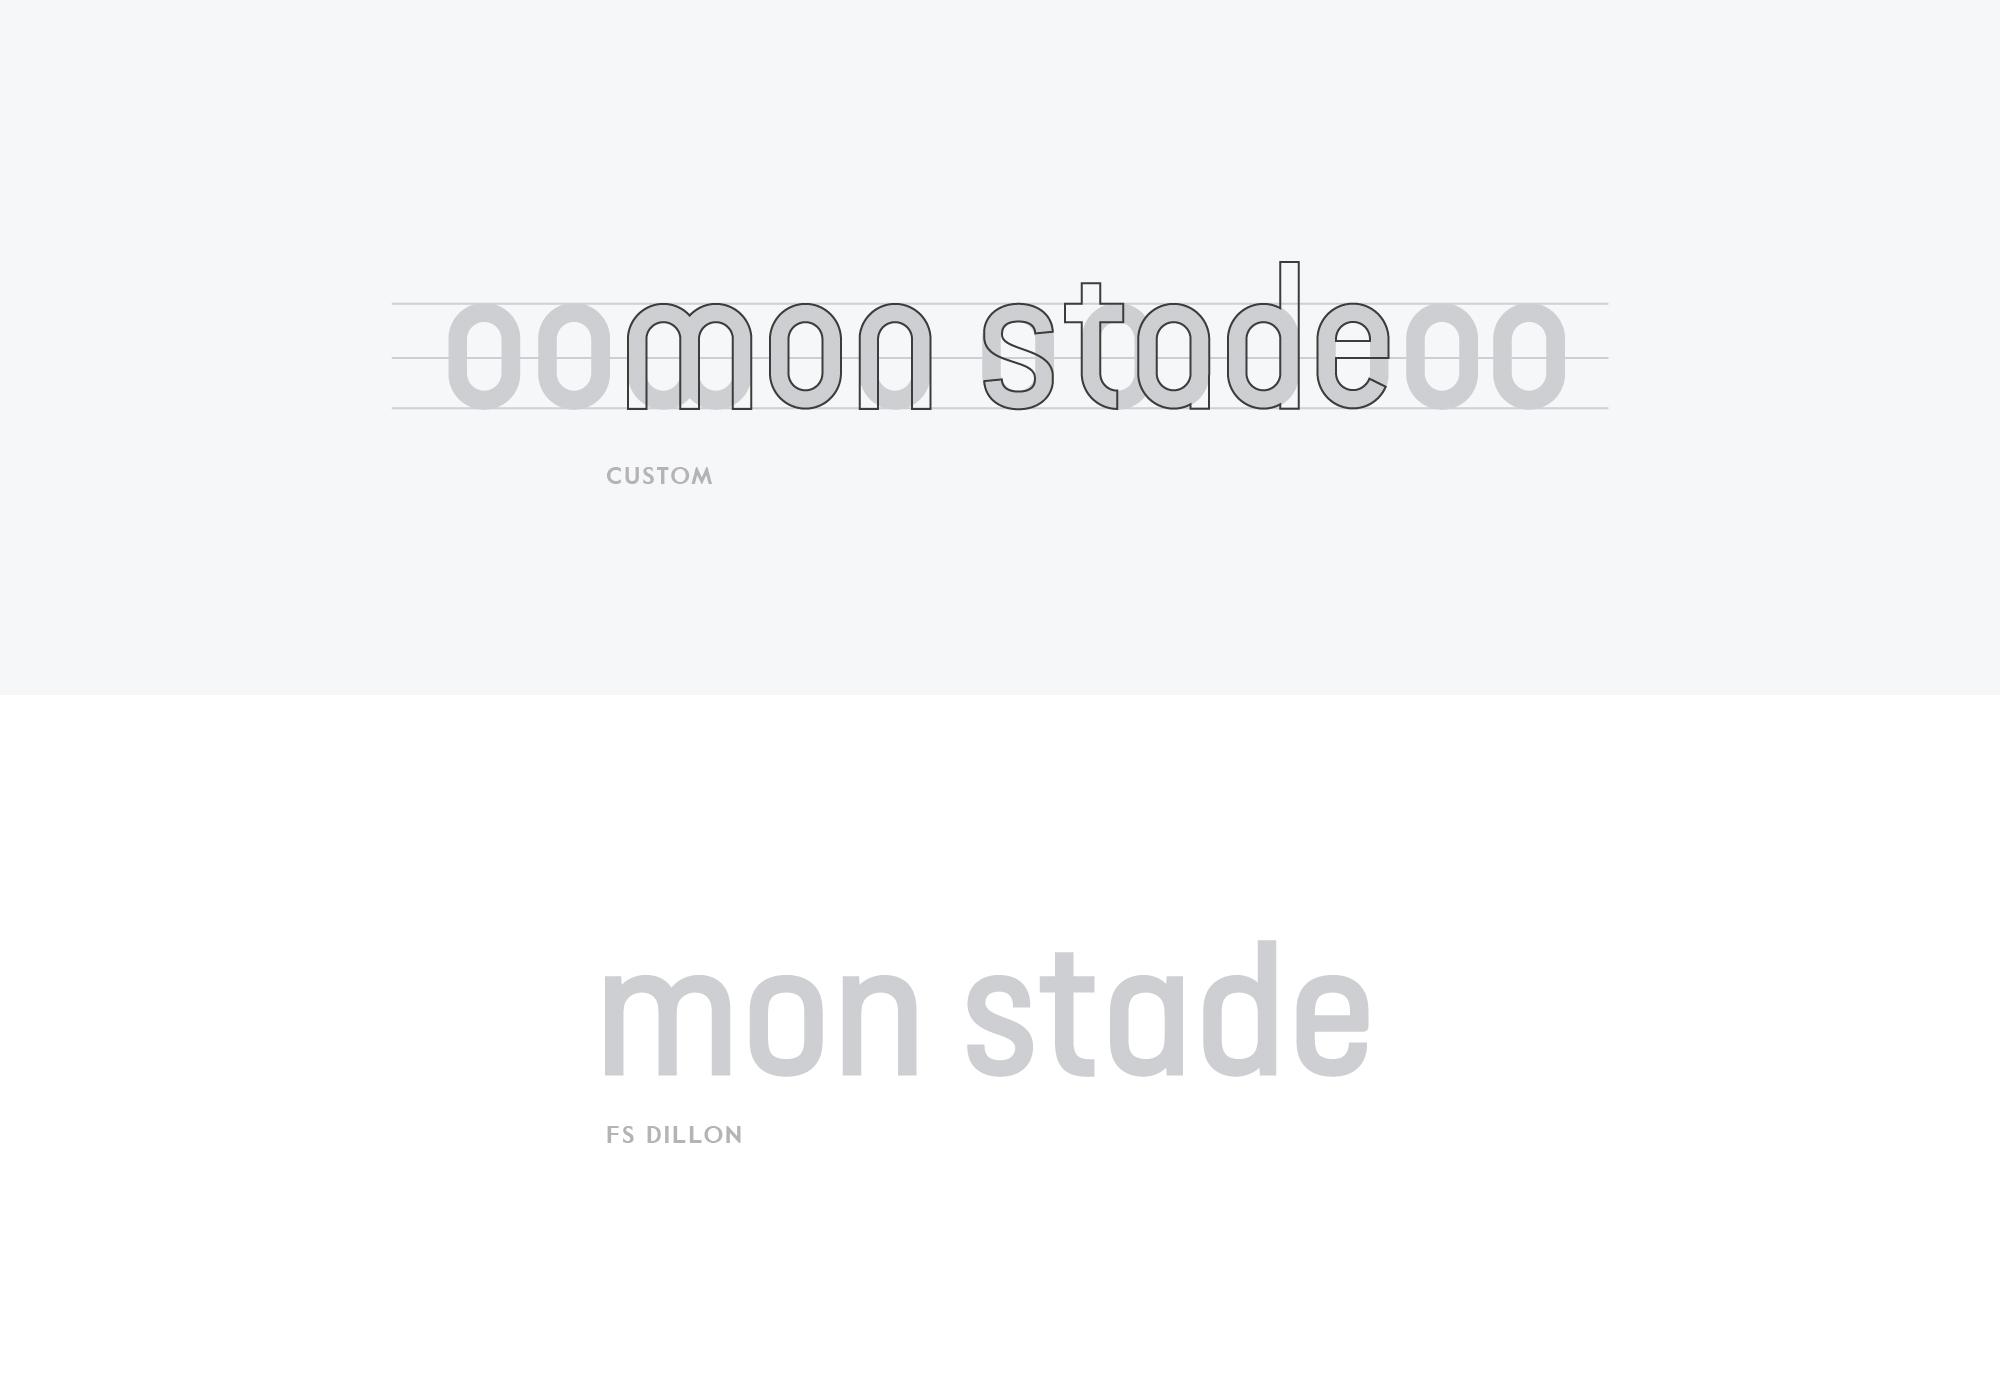 mon stade identité visuelle typographie custom